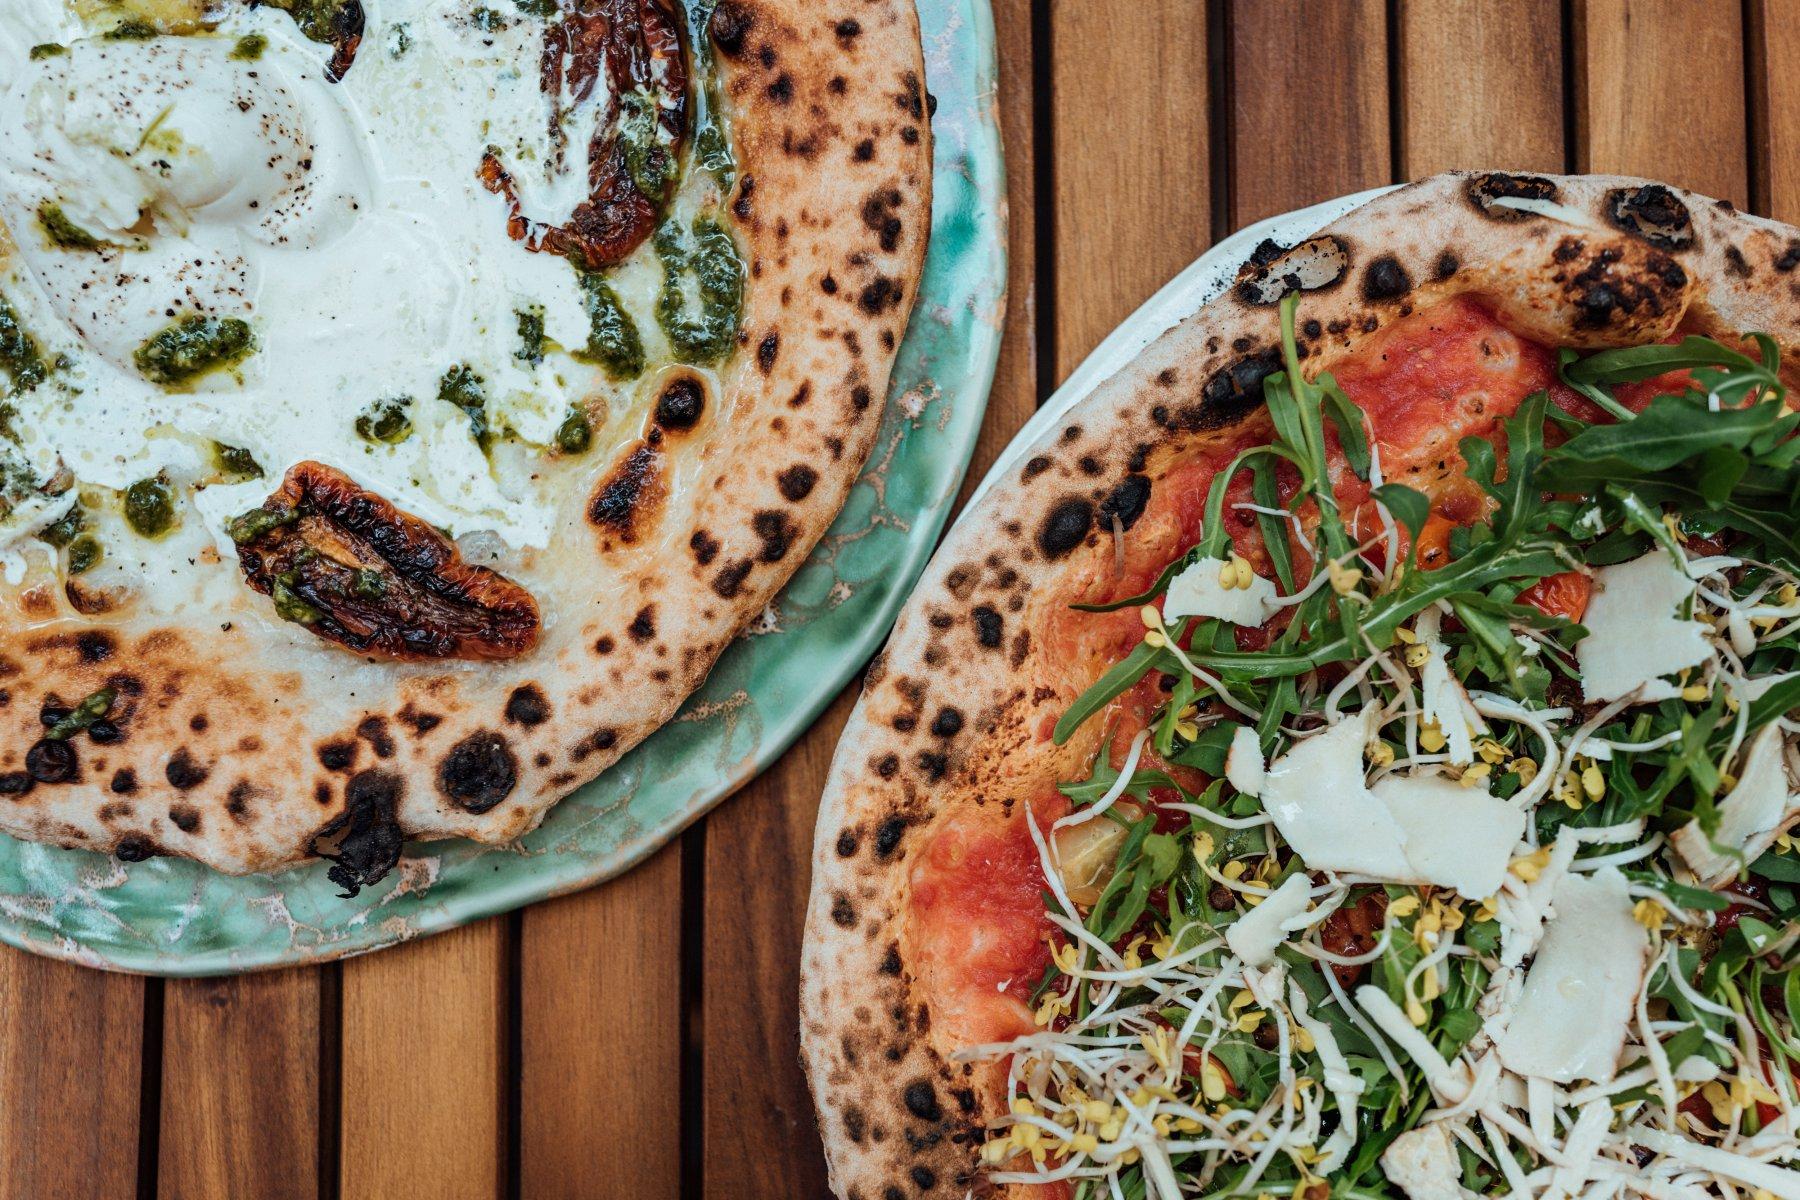 Tazzi Pizza St Pauli geheimtipp hamburg lisa knauer restaurant 47.jpg